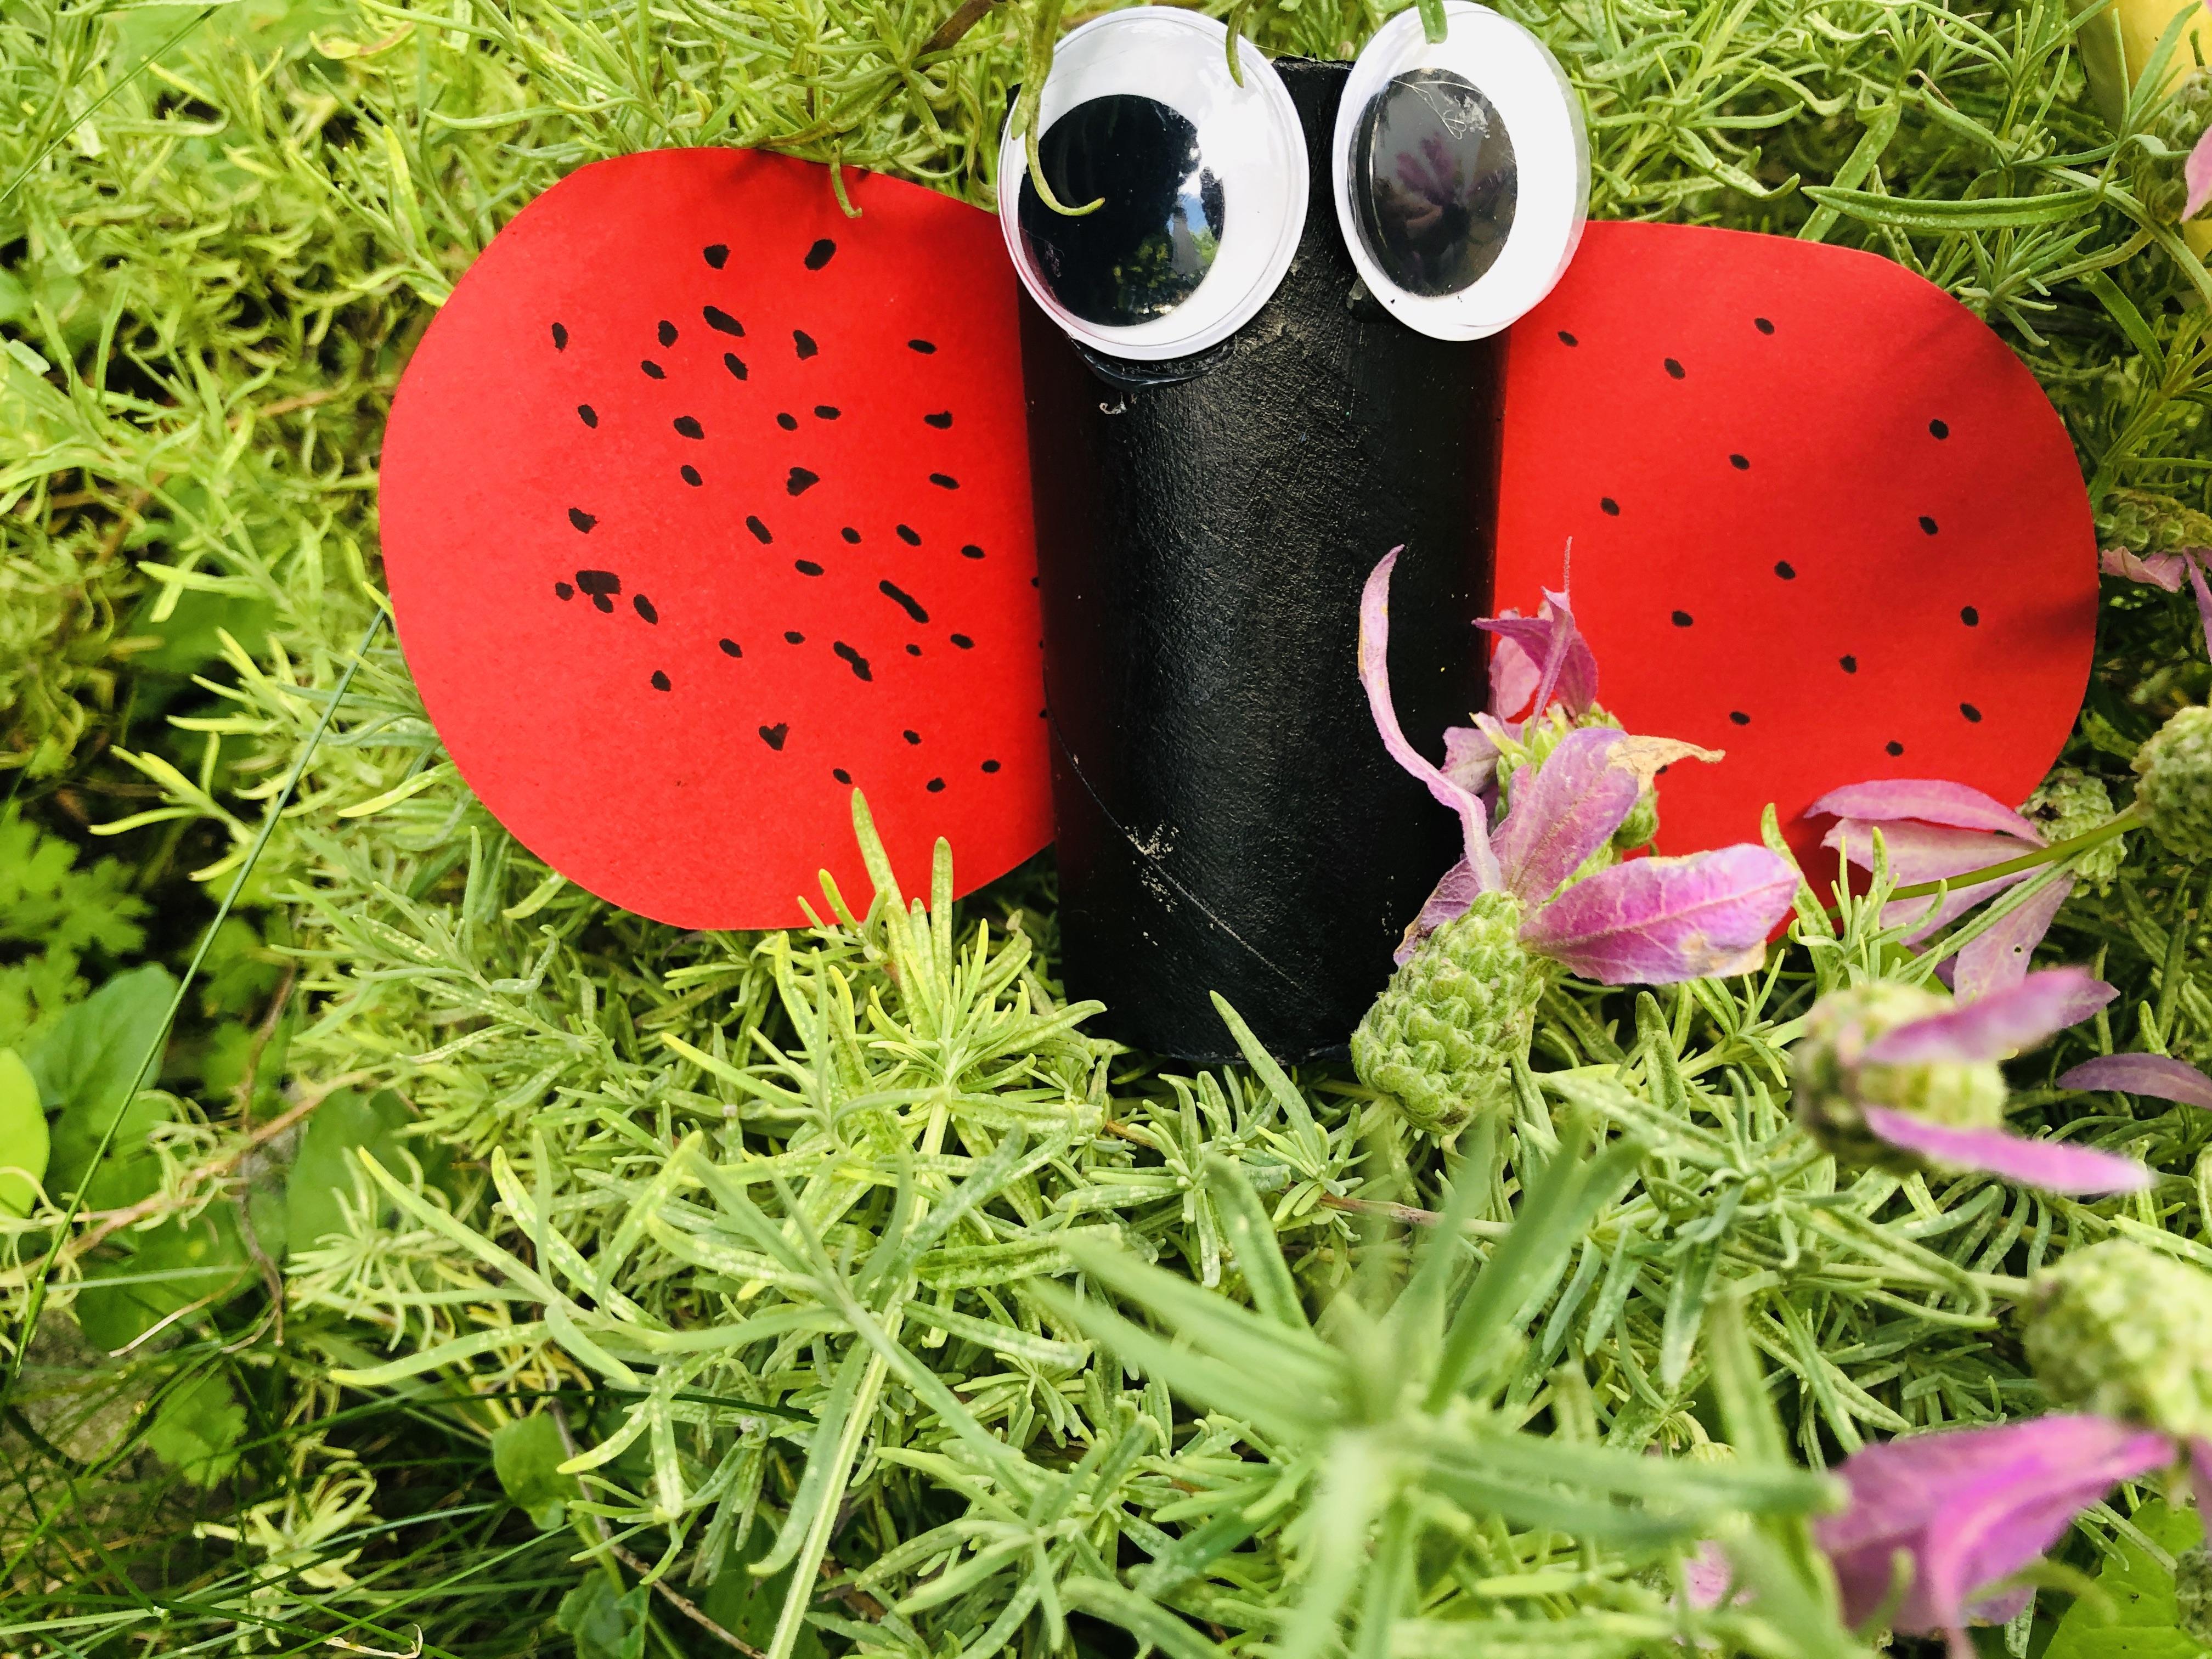 paper roll ladybug on a flower